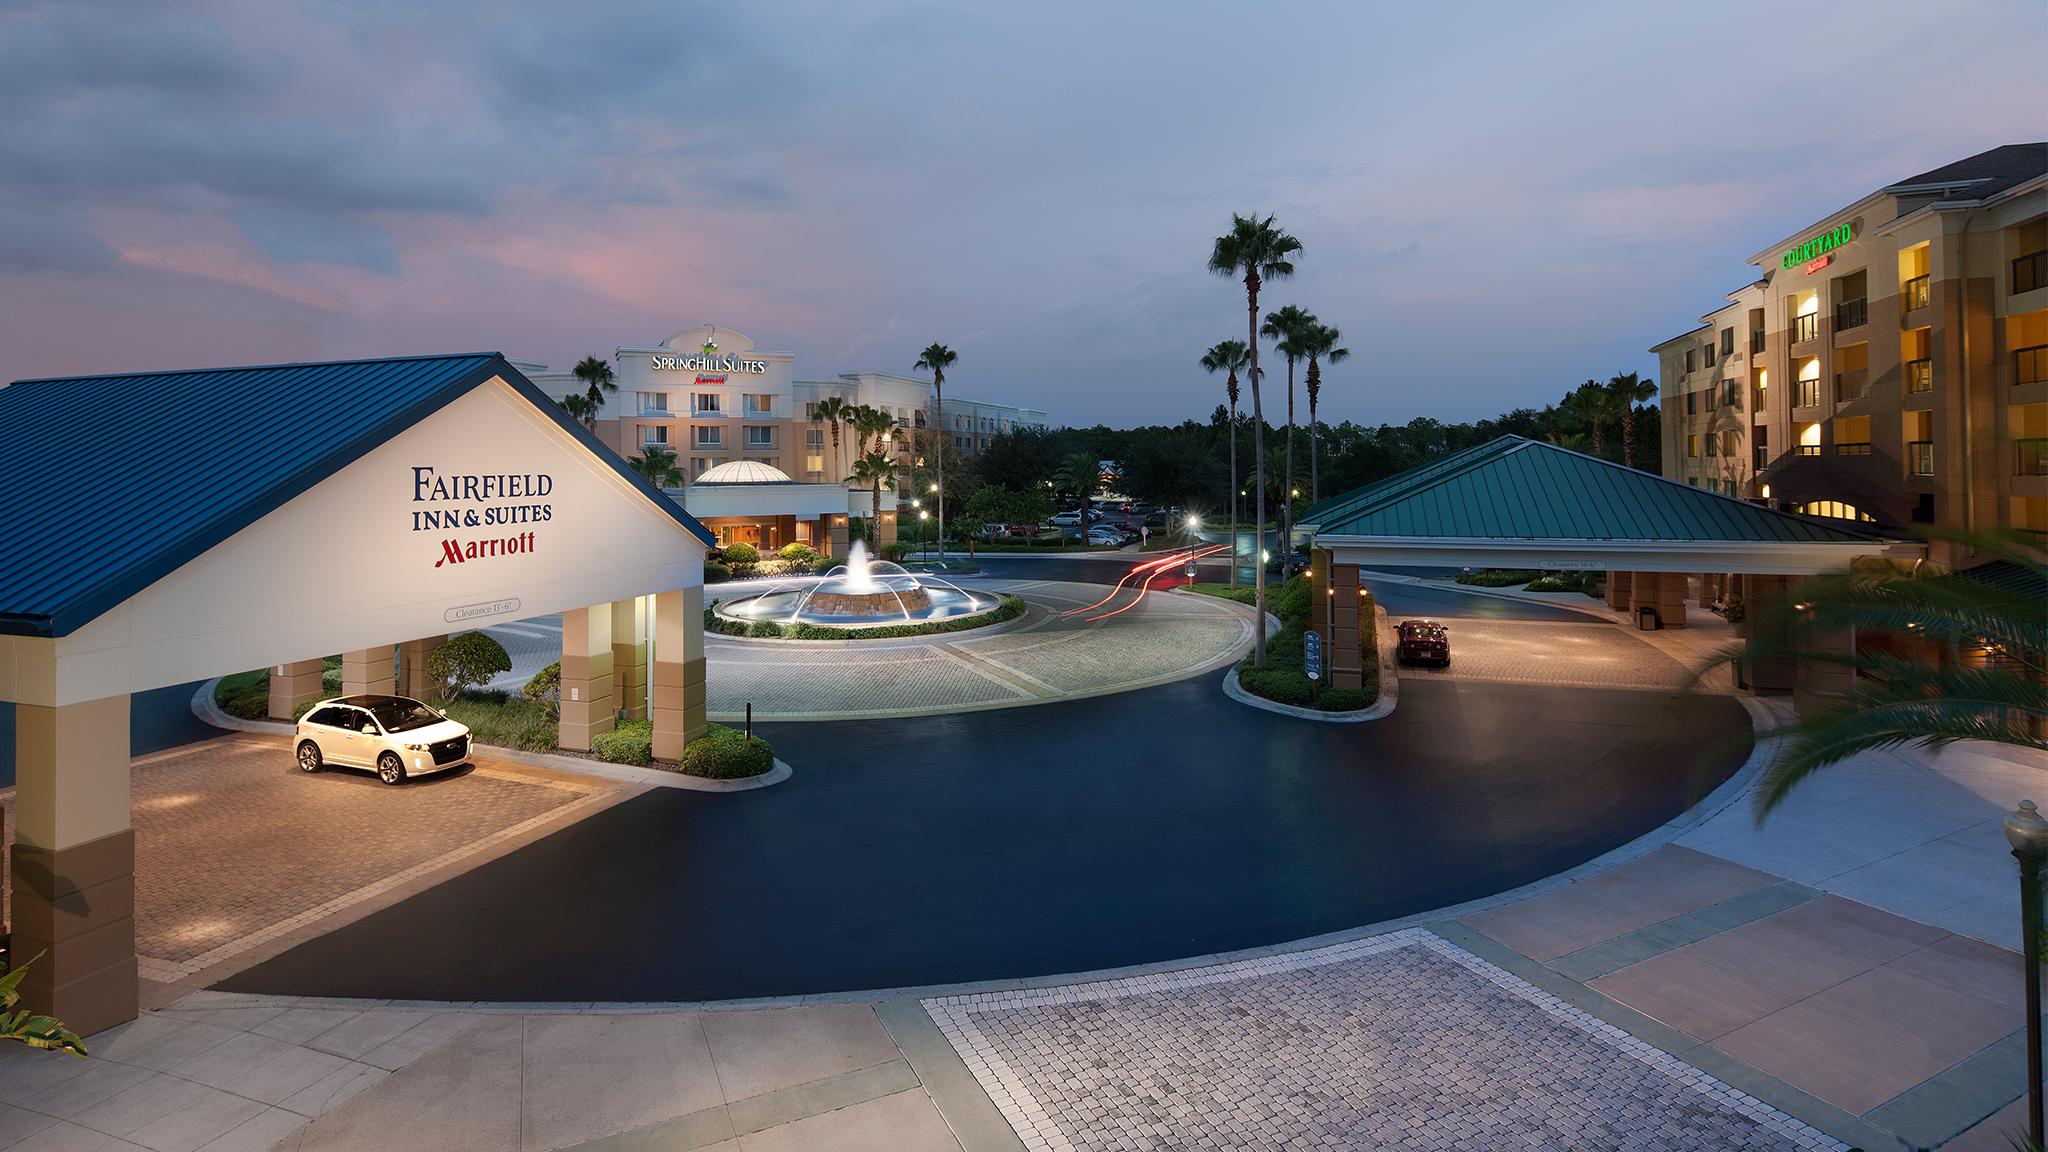 Springhill Suites Orlando Lake Buena Vista In The Marriott